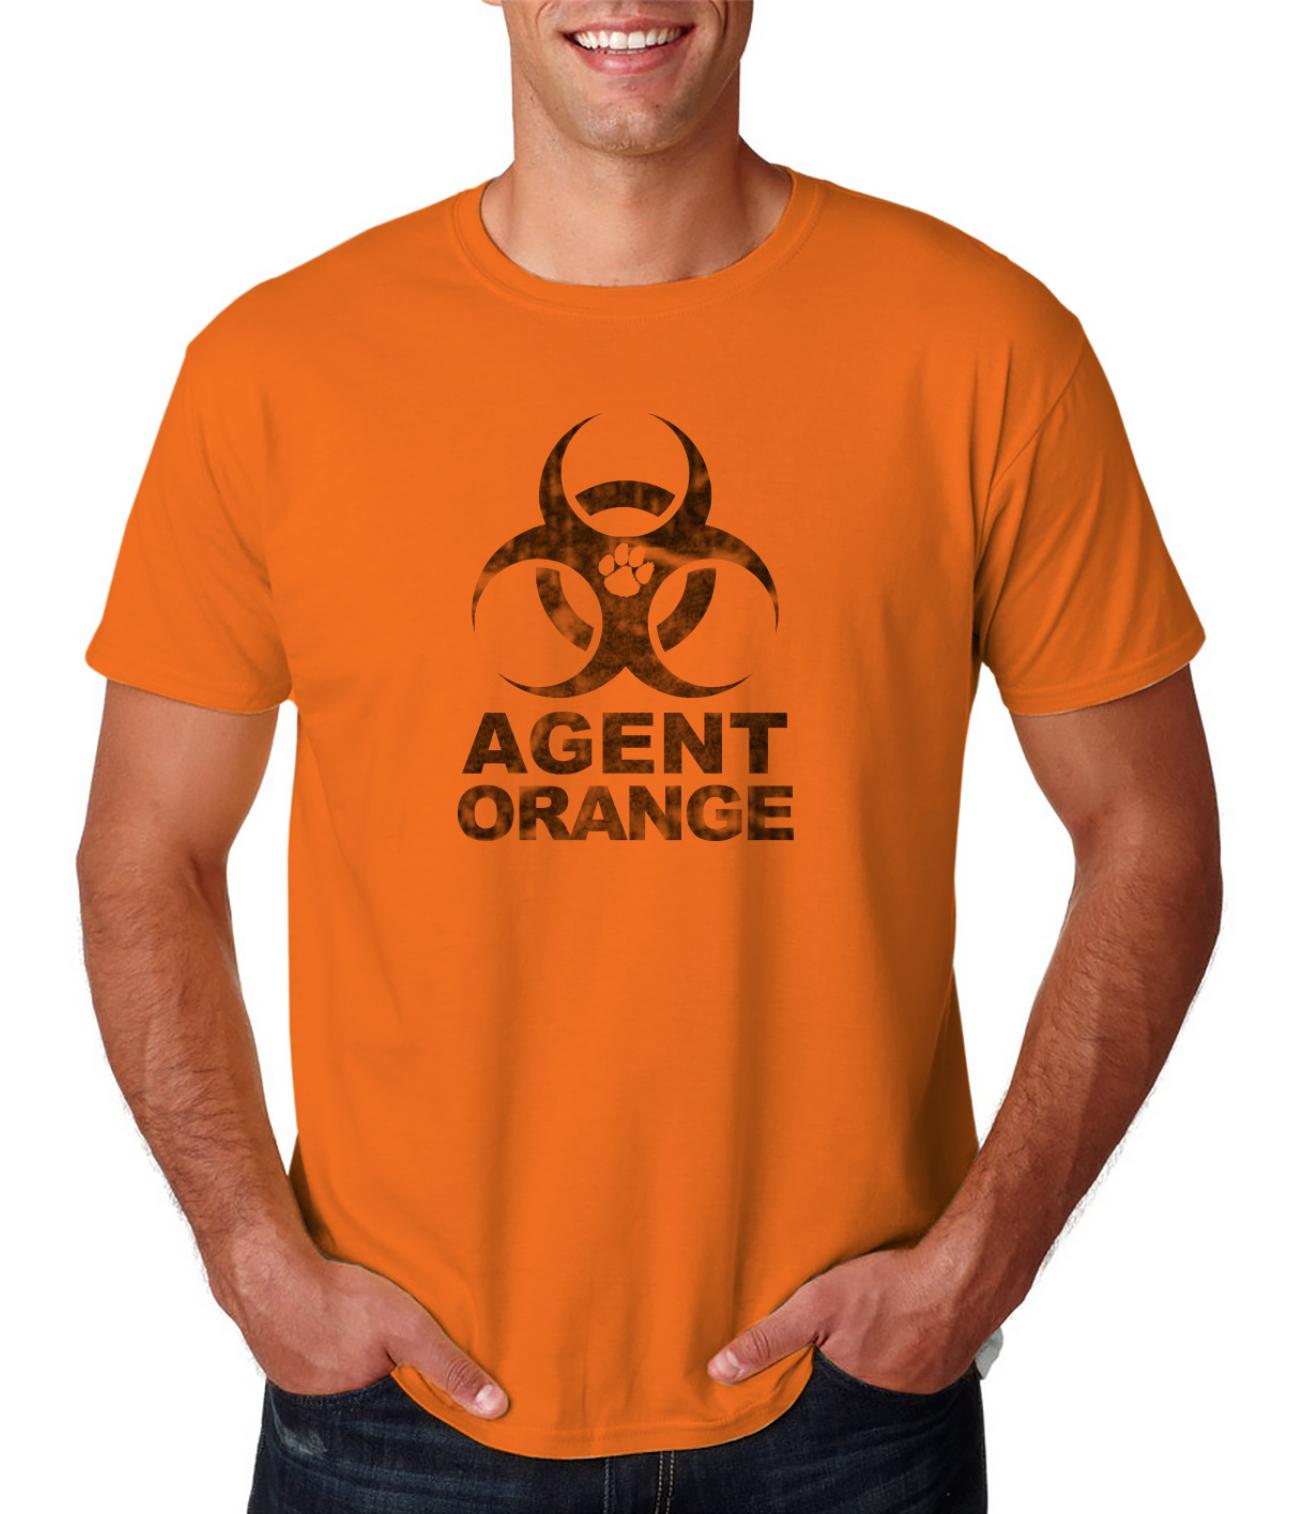 Agent Orange - Shirt.png